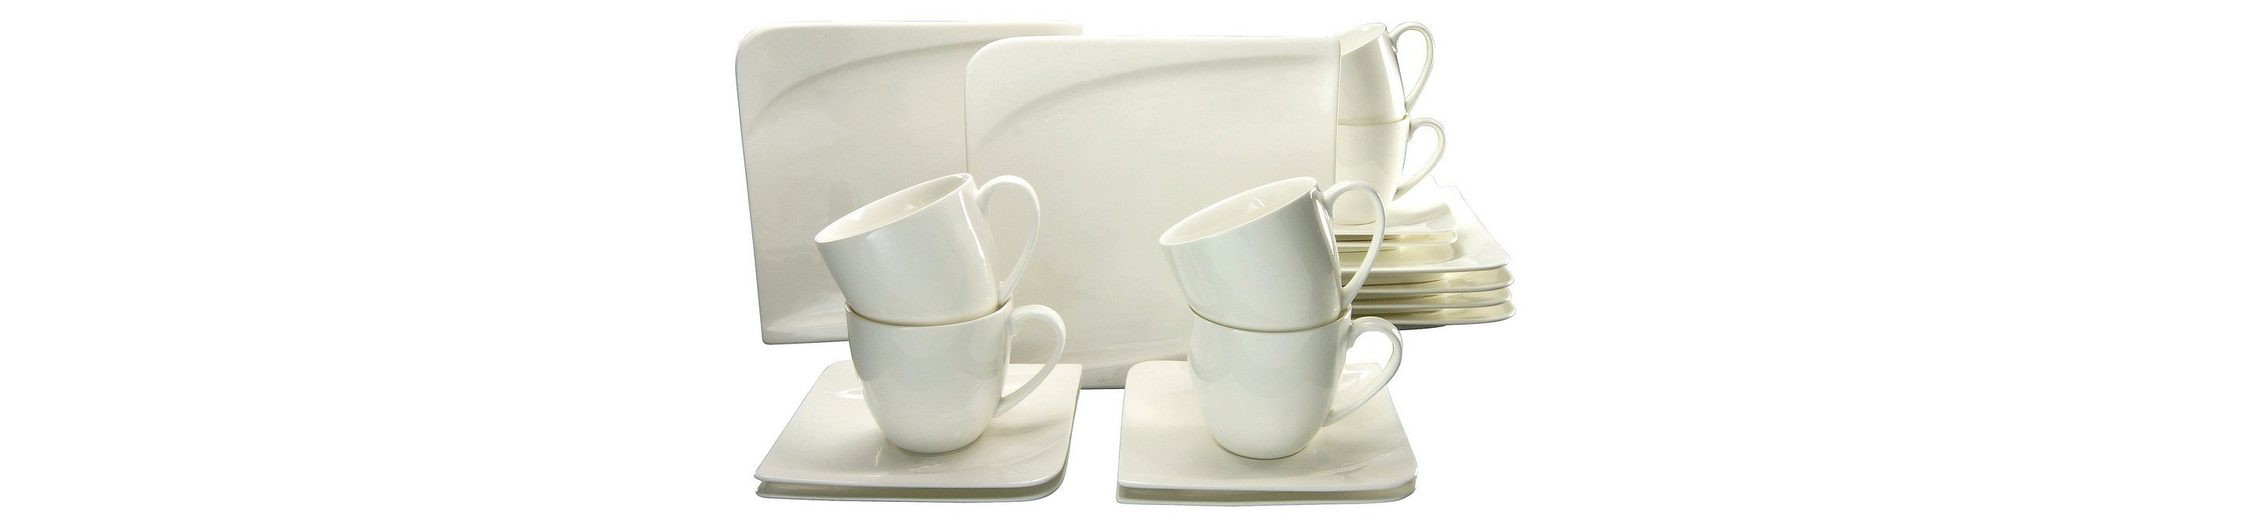 CreaTable Kaffeeservice, Porzellan, 18 Teile, »Java«